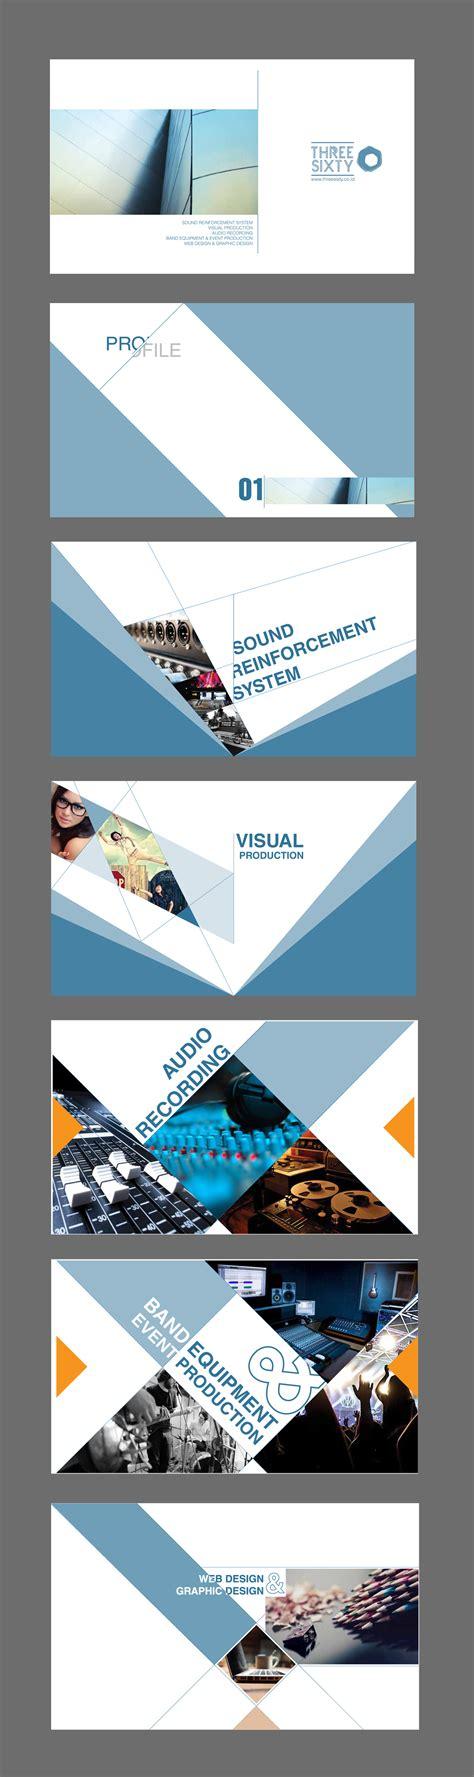 company profile design layout sle threesixty company profile template presentation